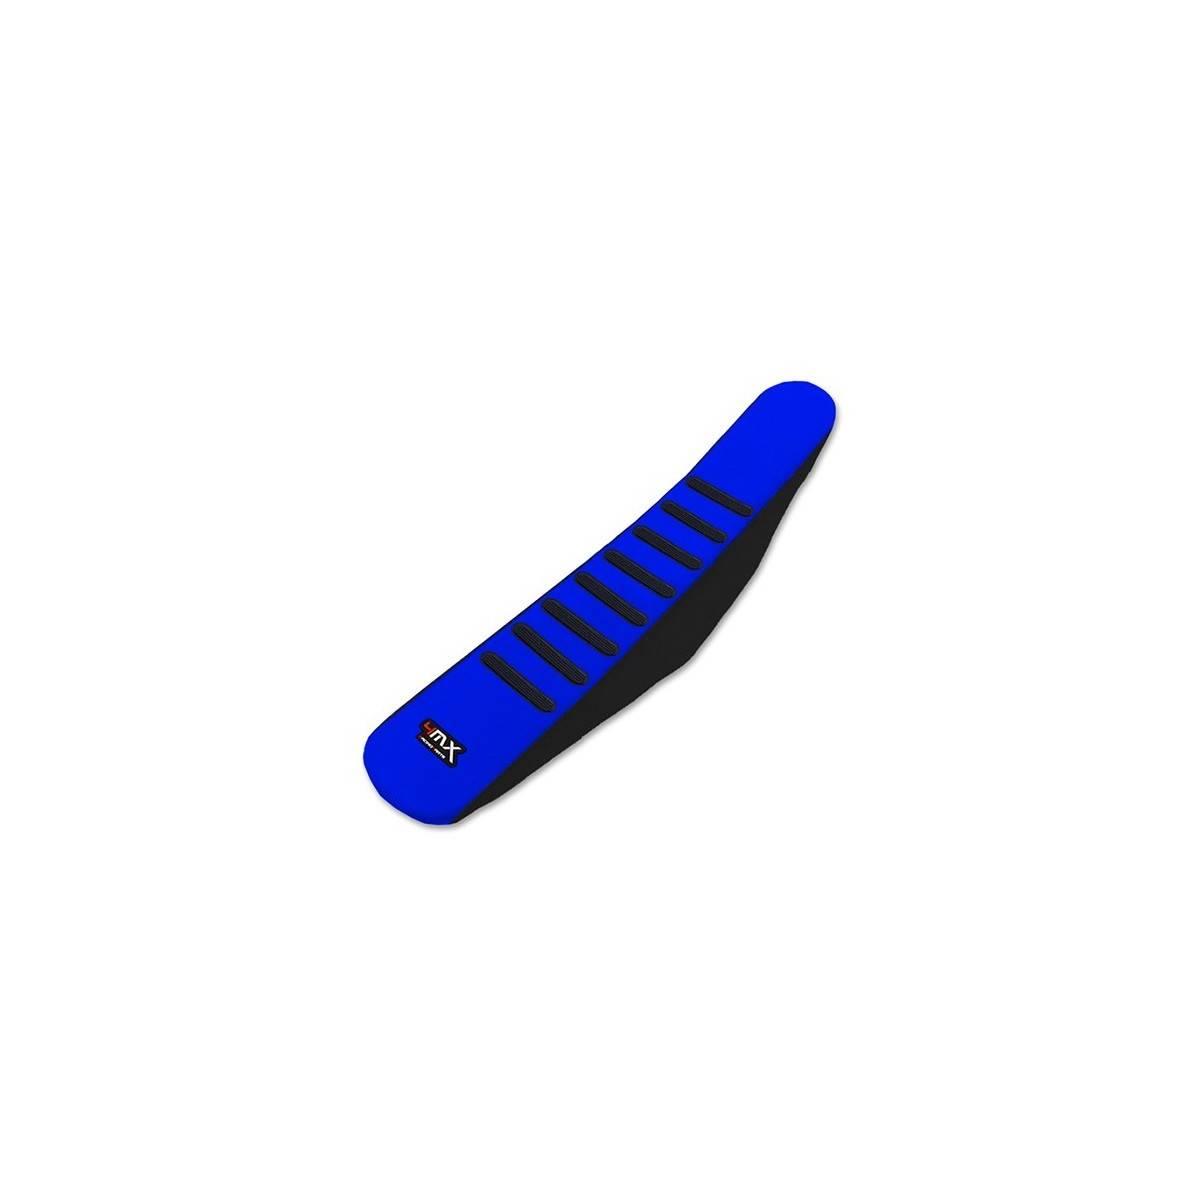 01CAP1023 - Funda Sillon 4Mx Yamaha Yzf 450 10 13´ Negro Azul